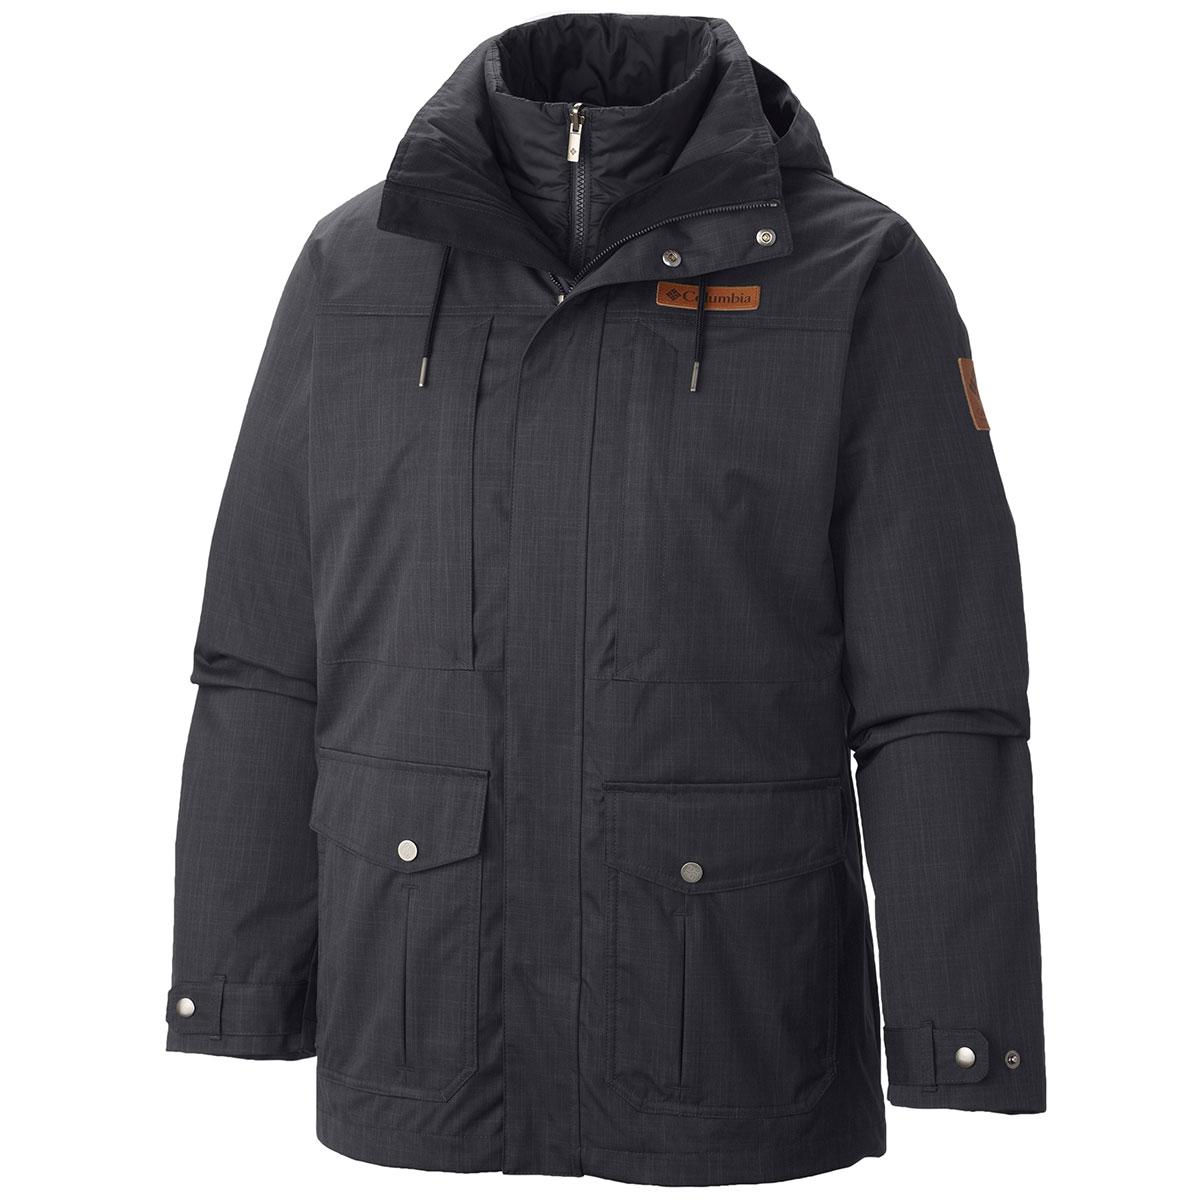 Columbia Men's Horizons Pine Interchange Jacket - Black, M